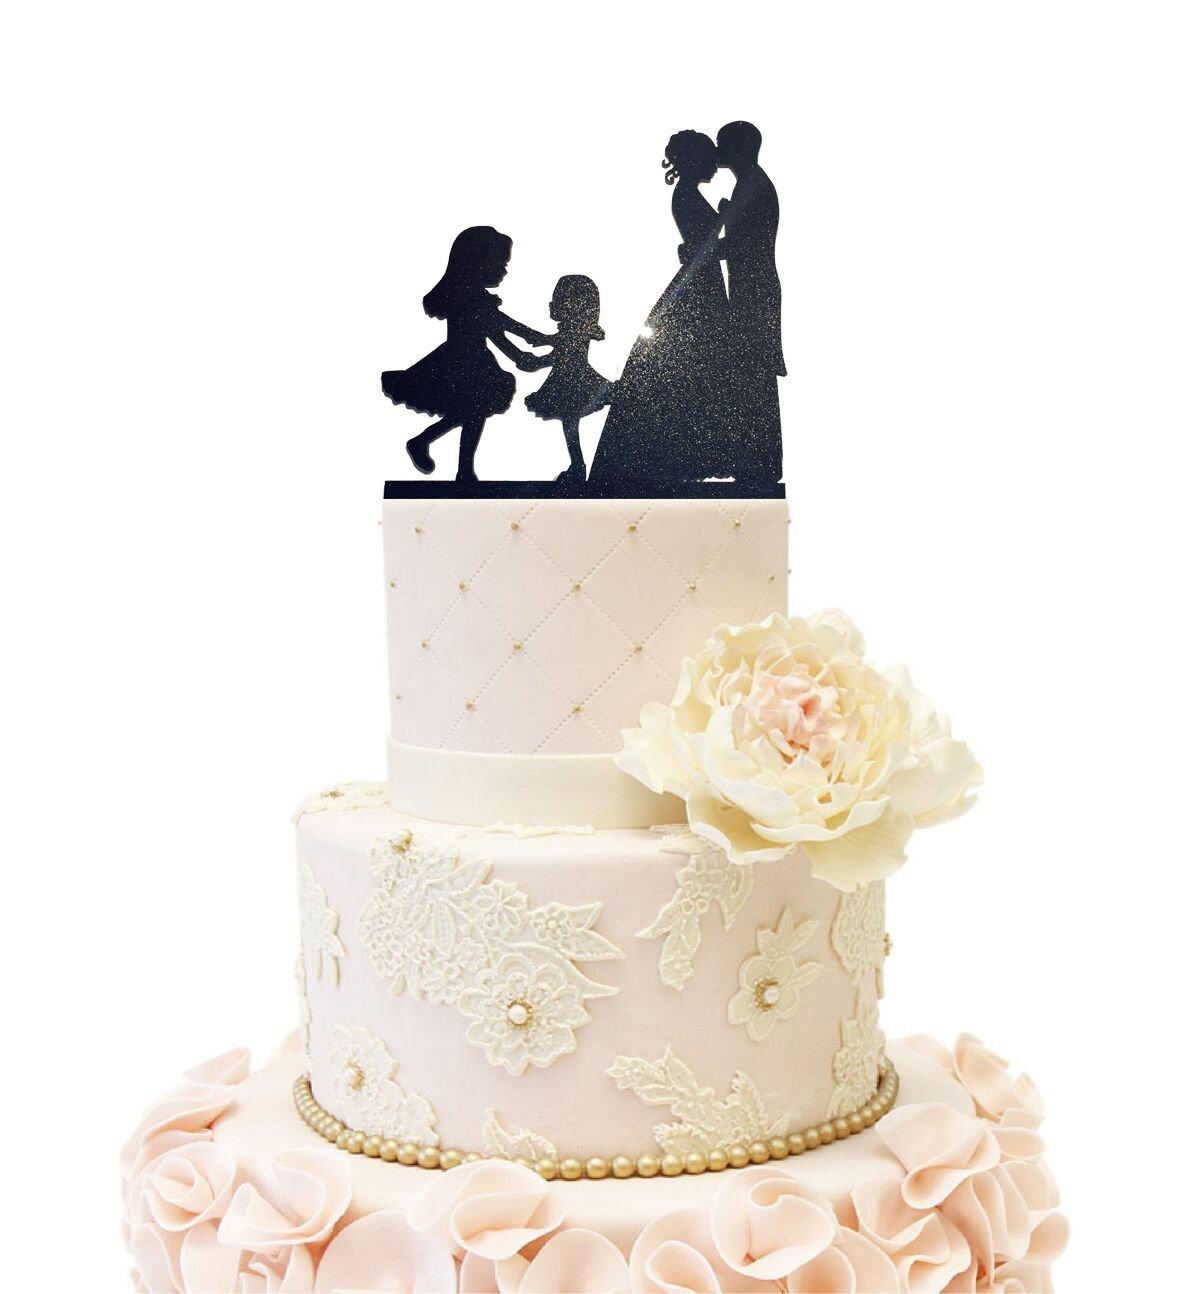 Amazon.com: Wedding Anniverary Cake Topper couple Bride Groom with 2 ...